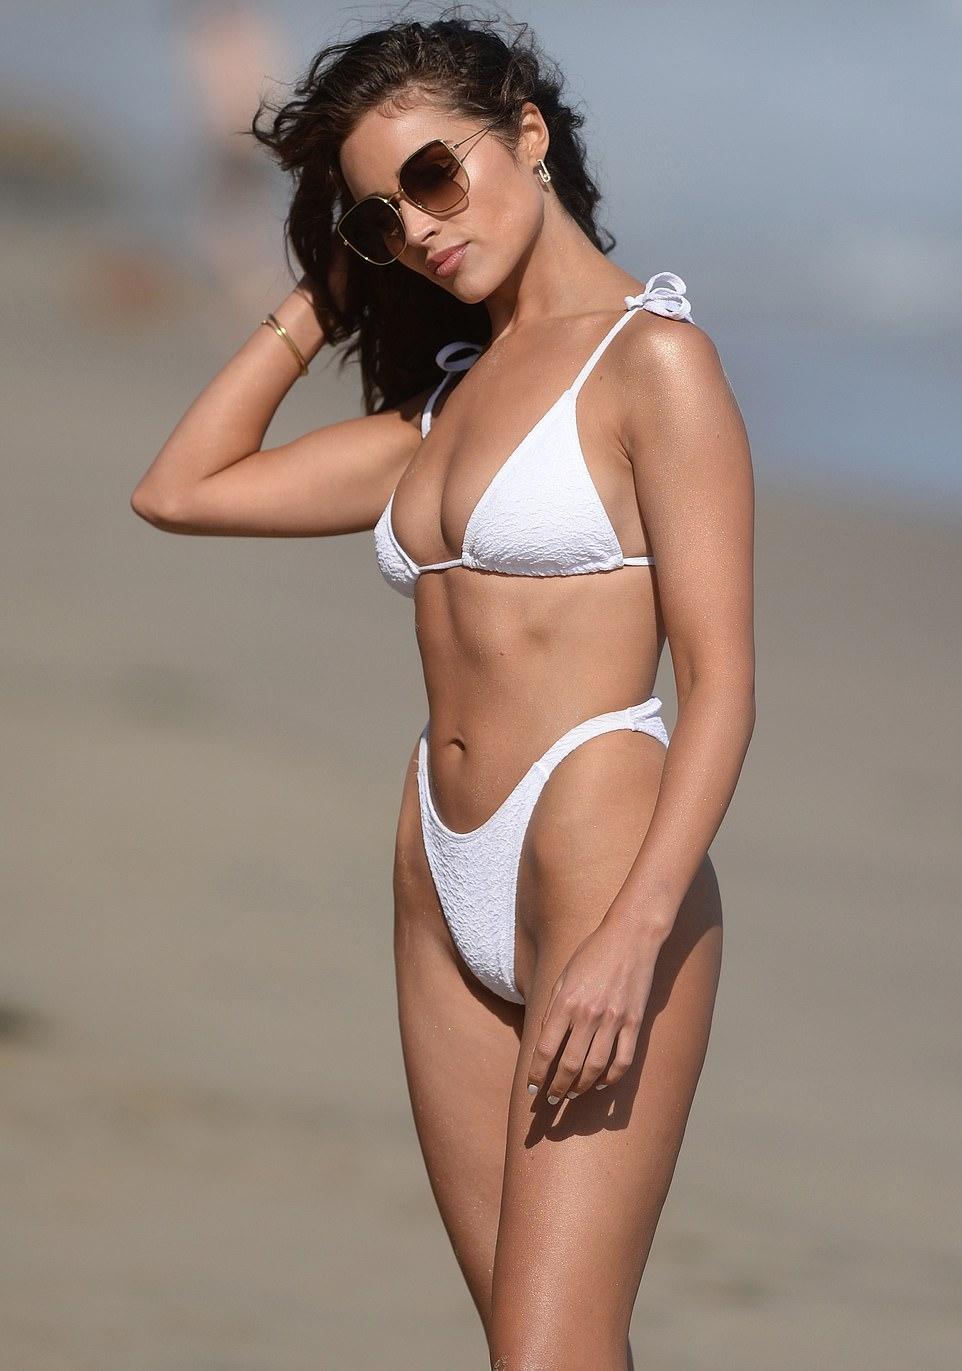 Olivia Culpo donning skimpy white low rise bikini bottom with creased detailing